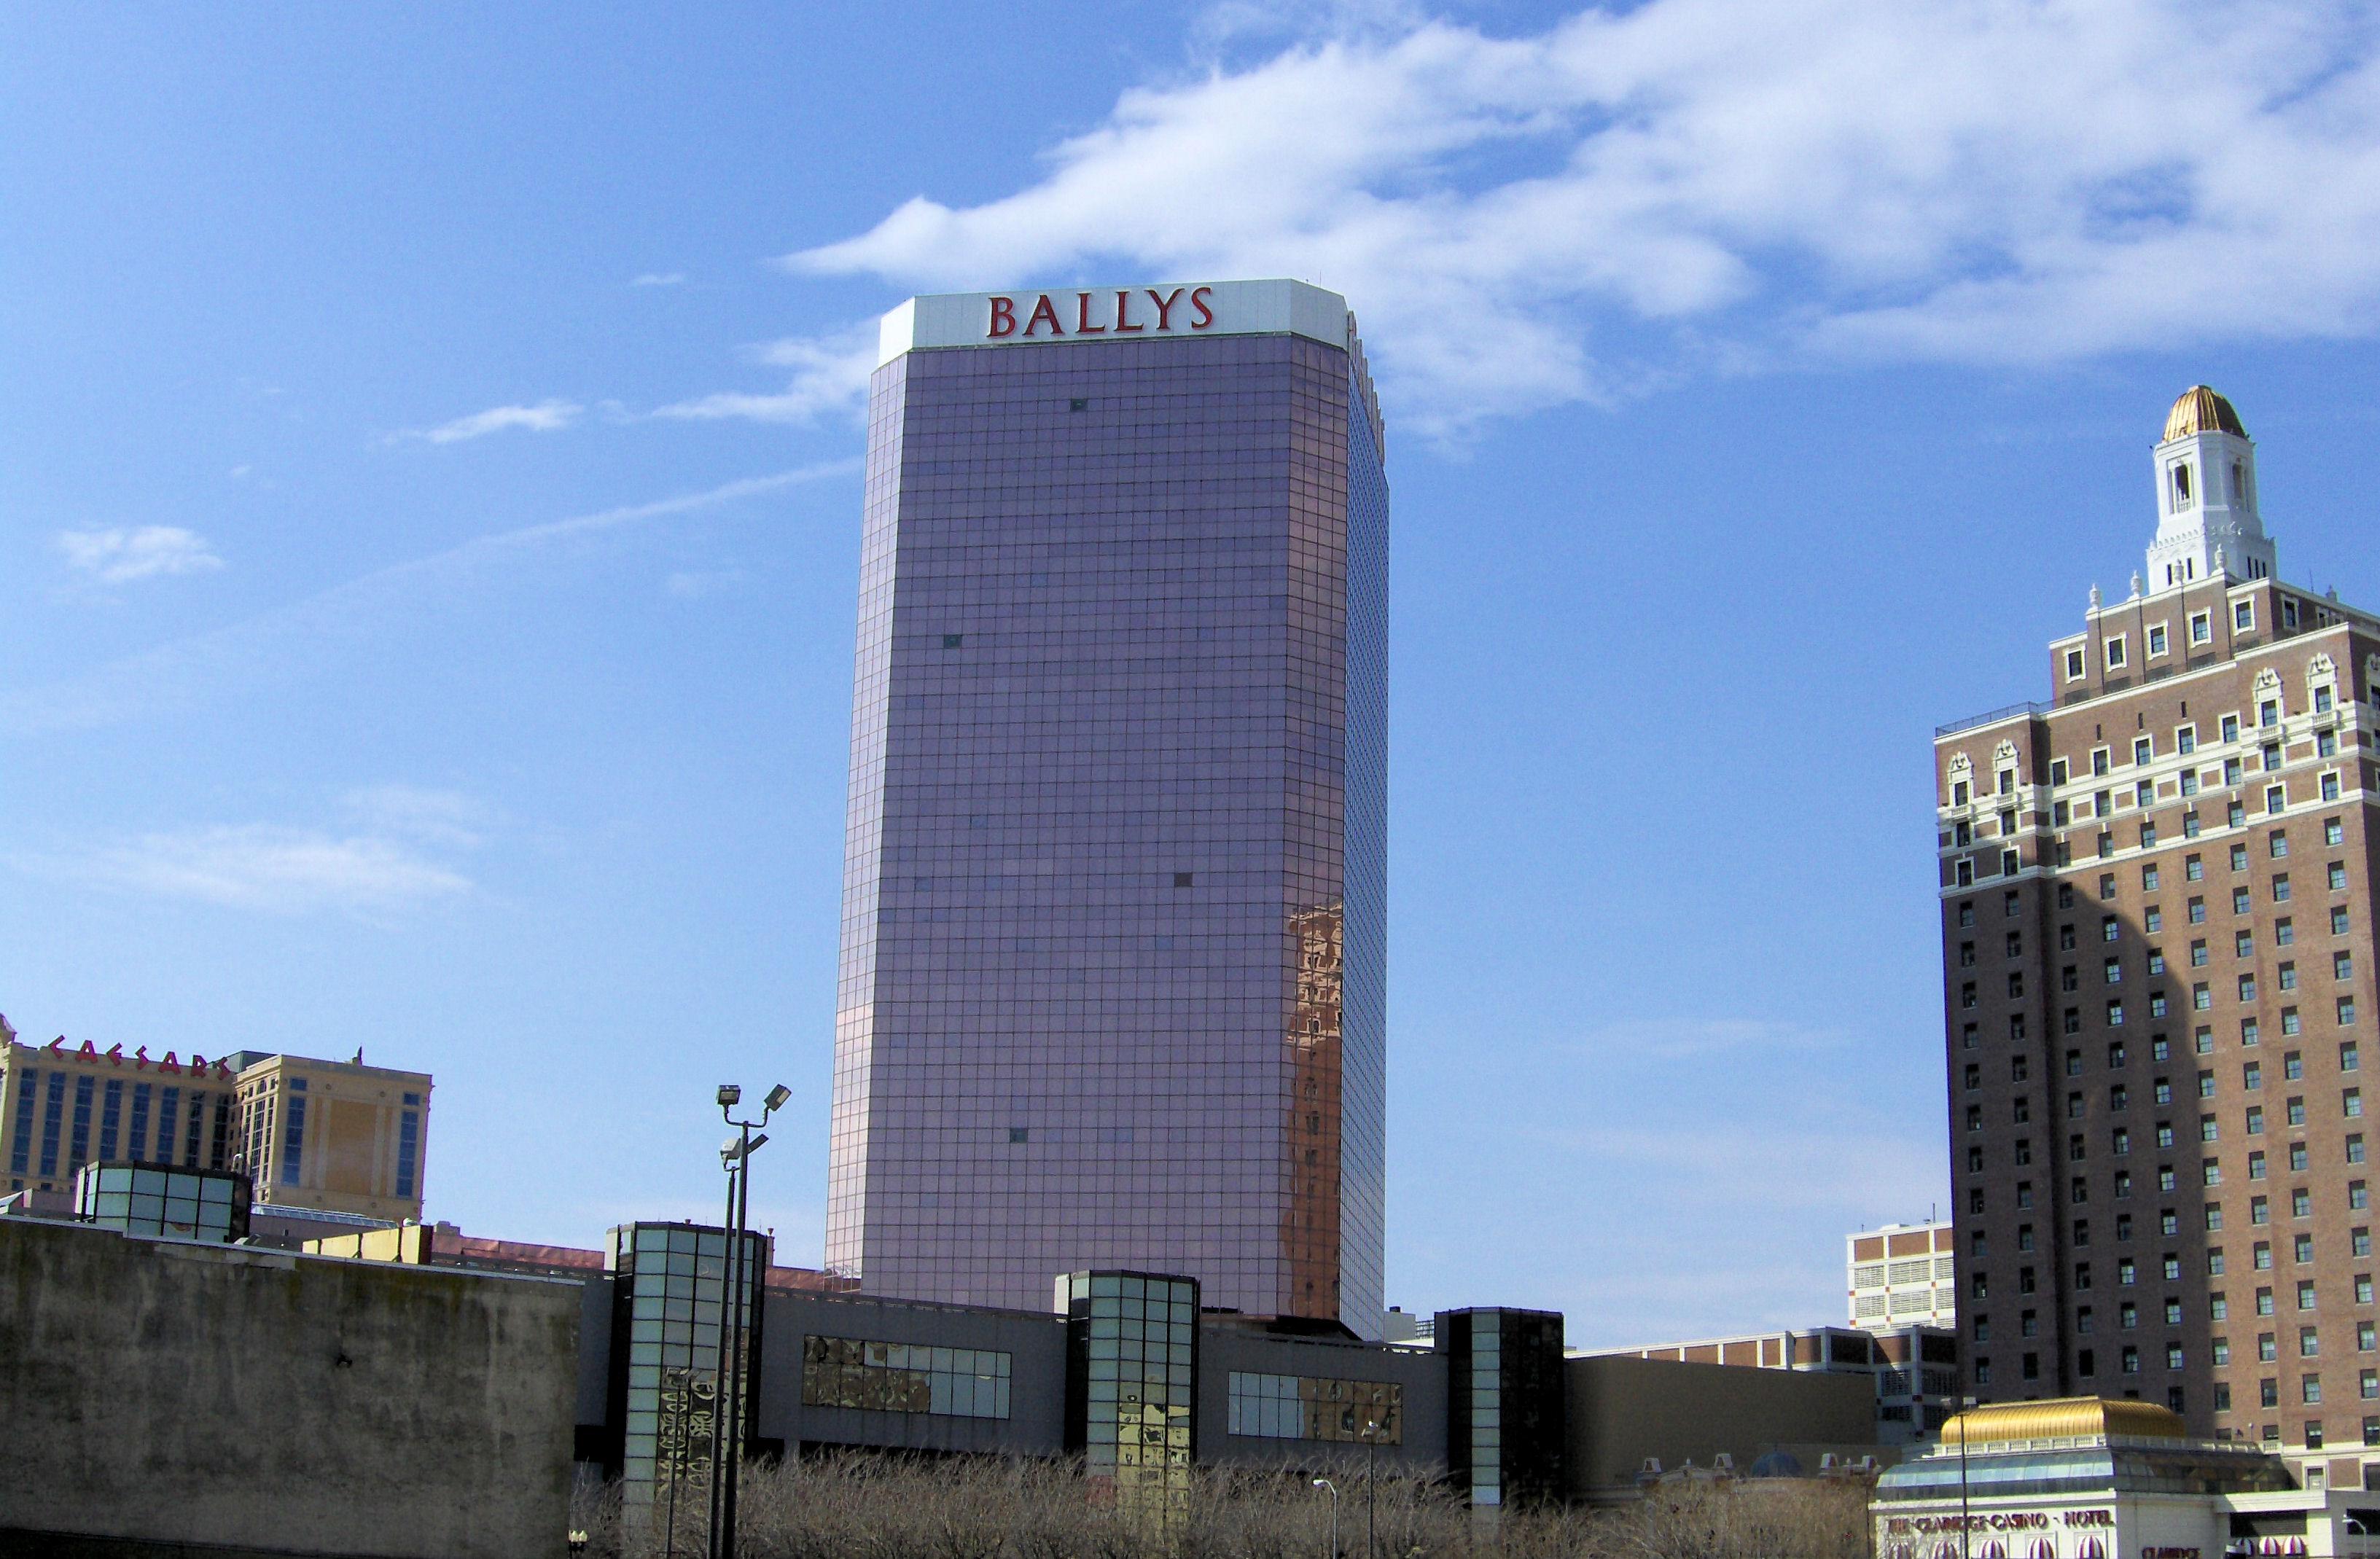 Claridge casino at ballys customers annual win loss statement harrahs casino